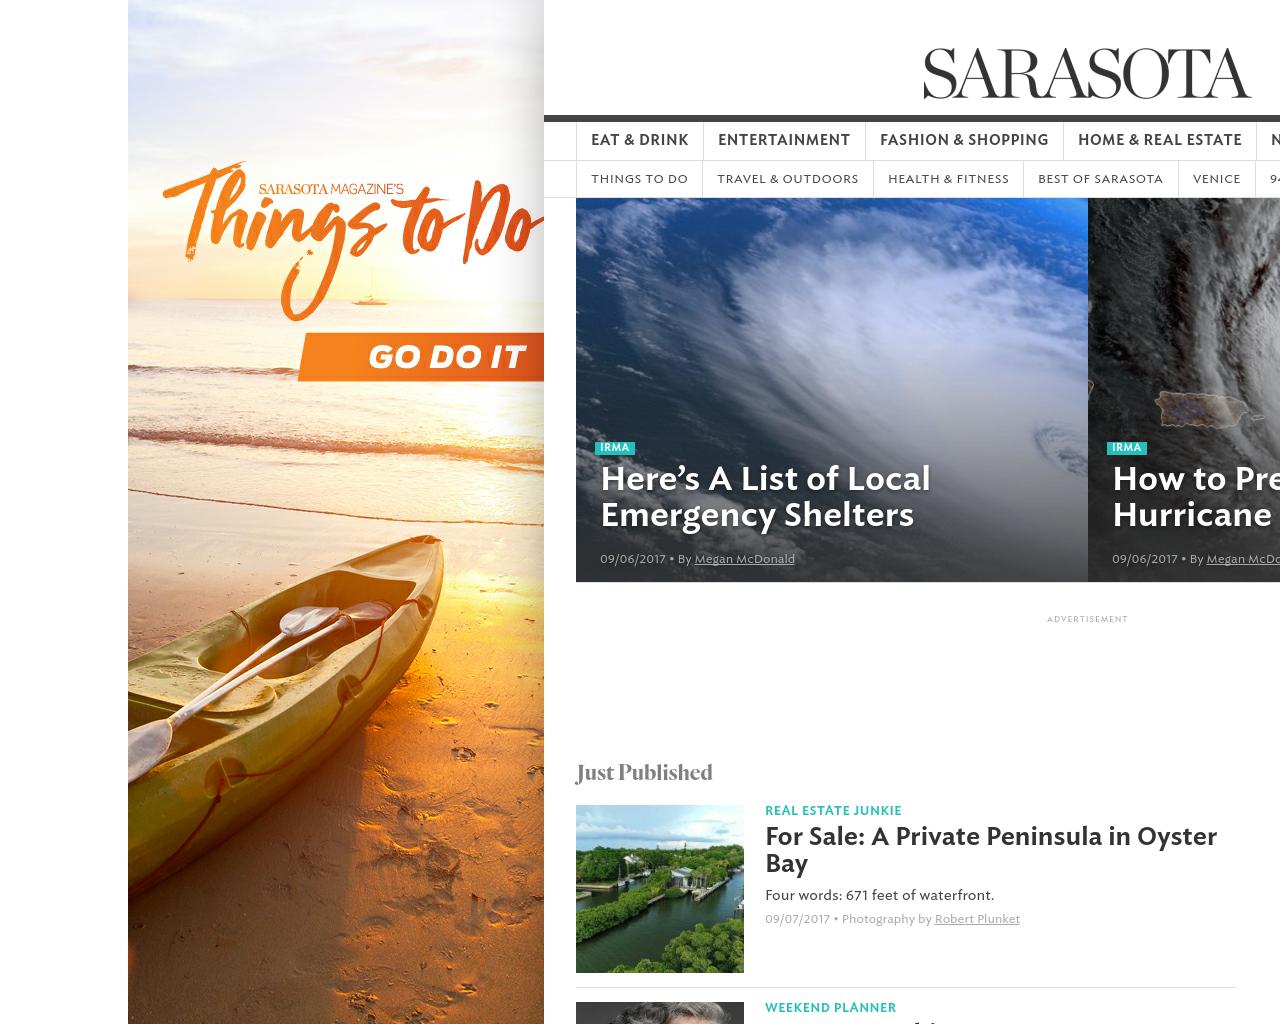 Sarasota-Magazine-Advertising-Reviews-Pricing